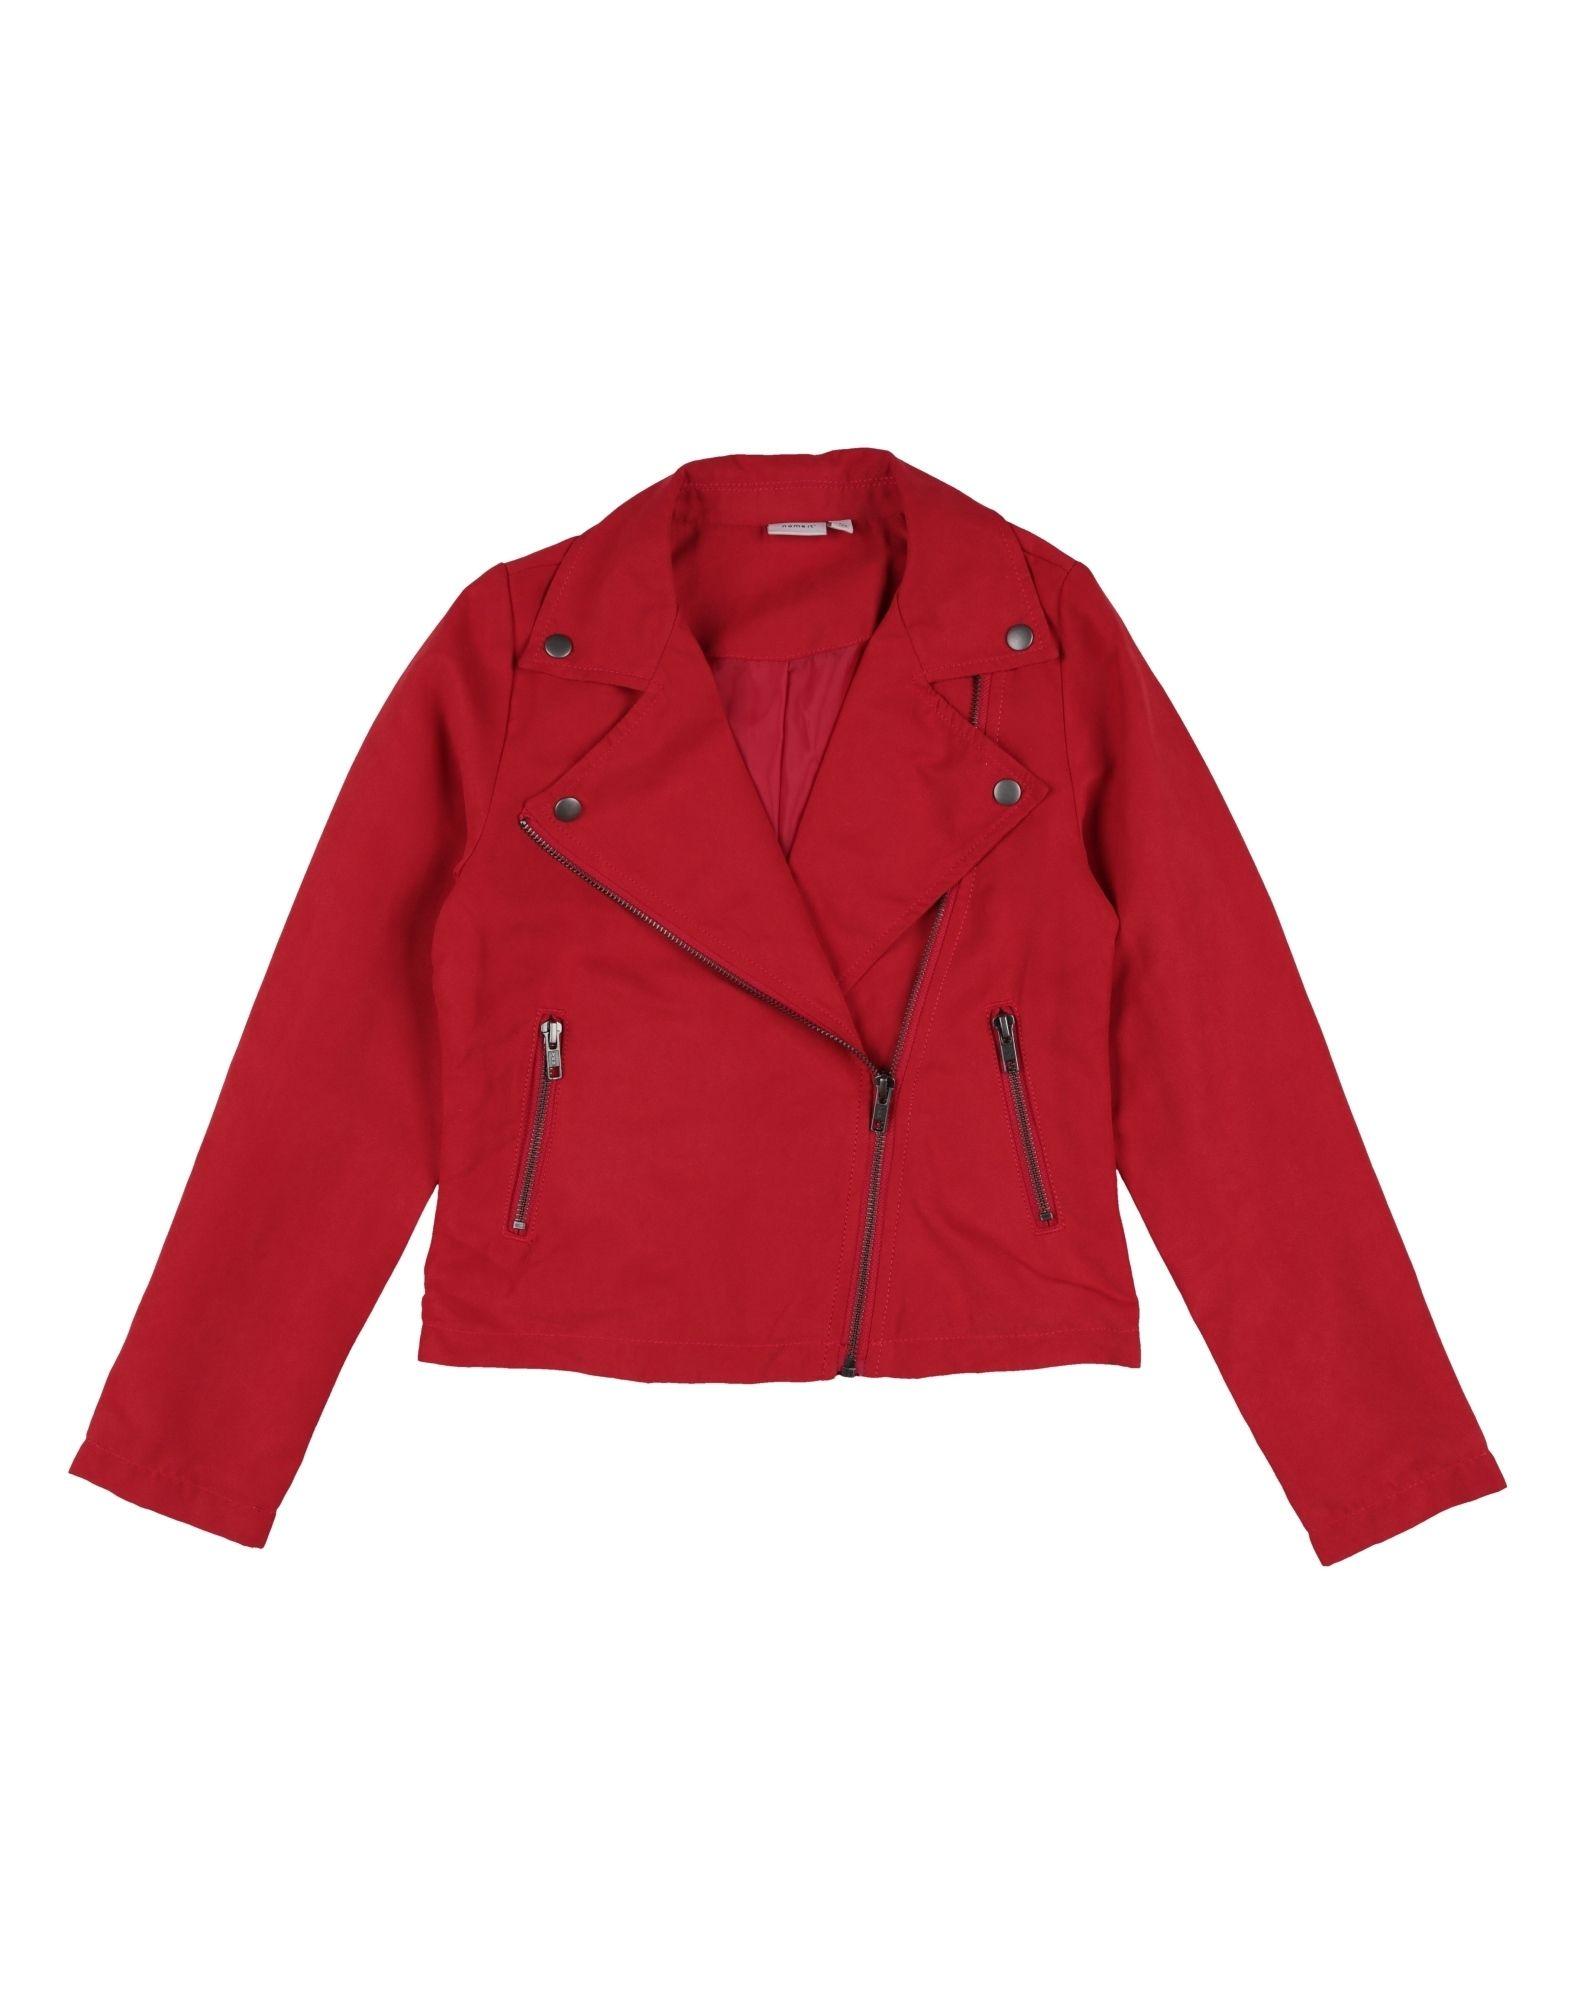 NAME IT® Mädchen 9-16 jahre Jacke6 rot